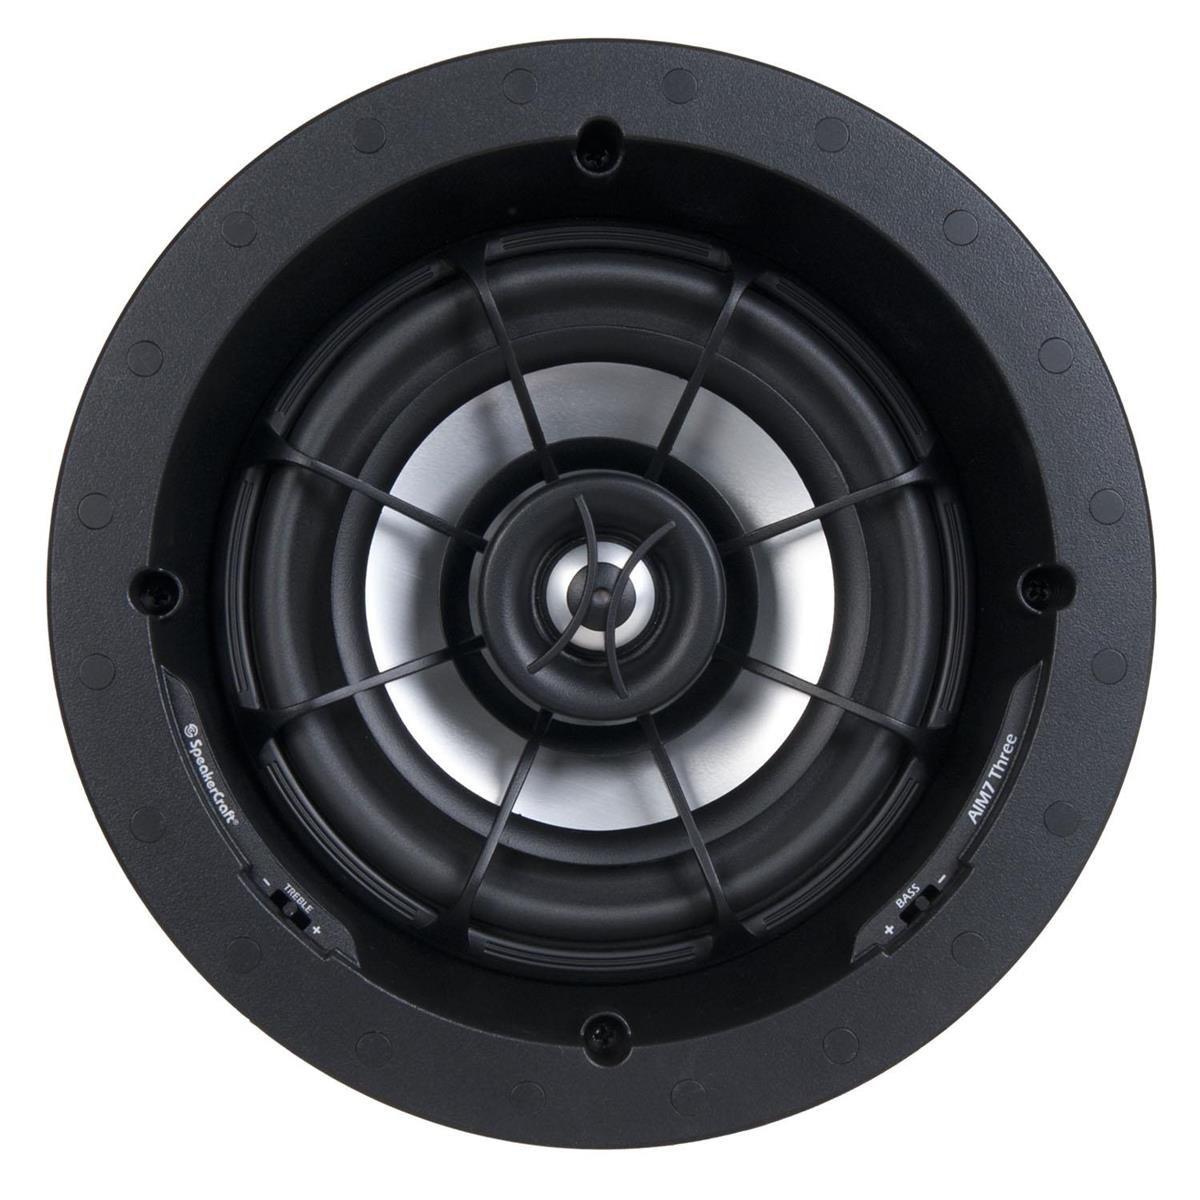 SpeakerCraft Profile AIM7 Three in-ceiling speakers (EACH) by SpeakerCraft